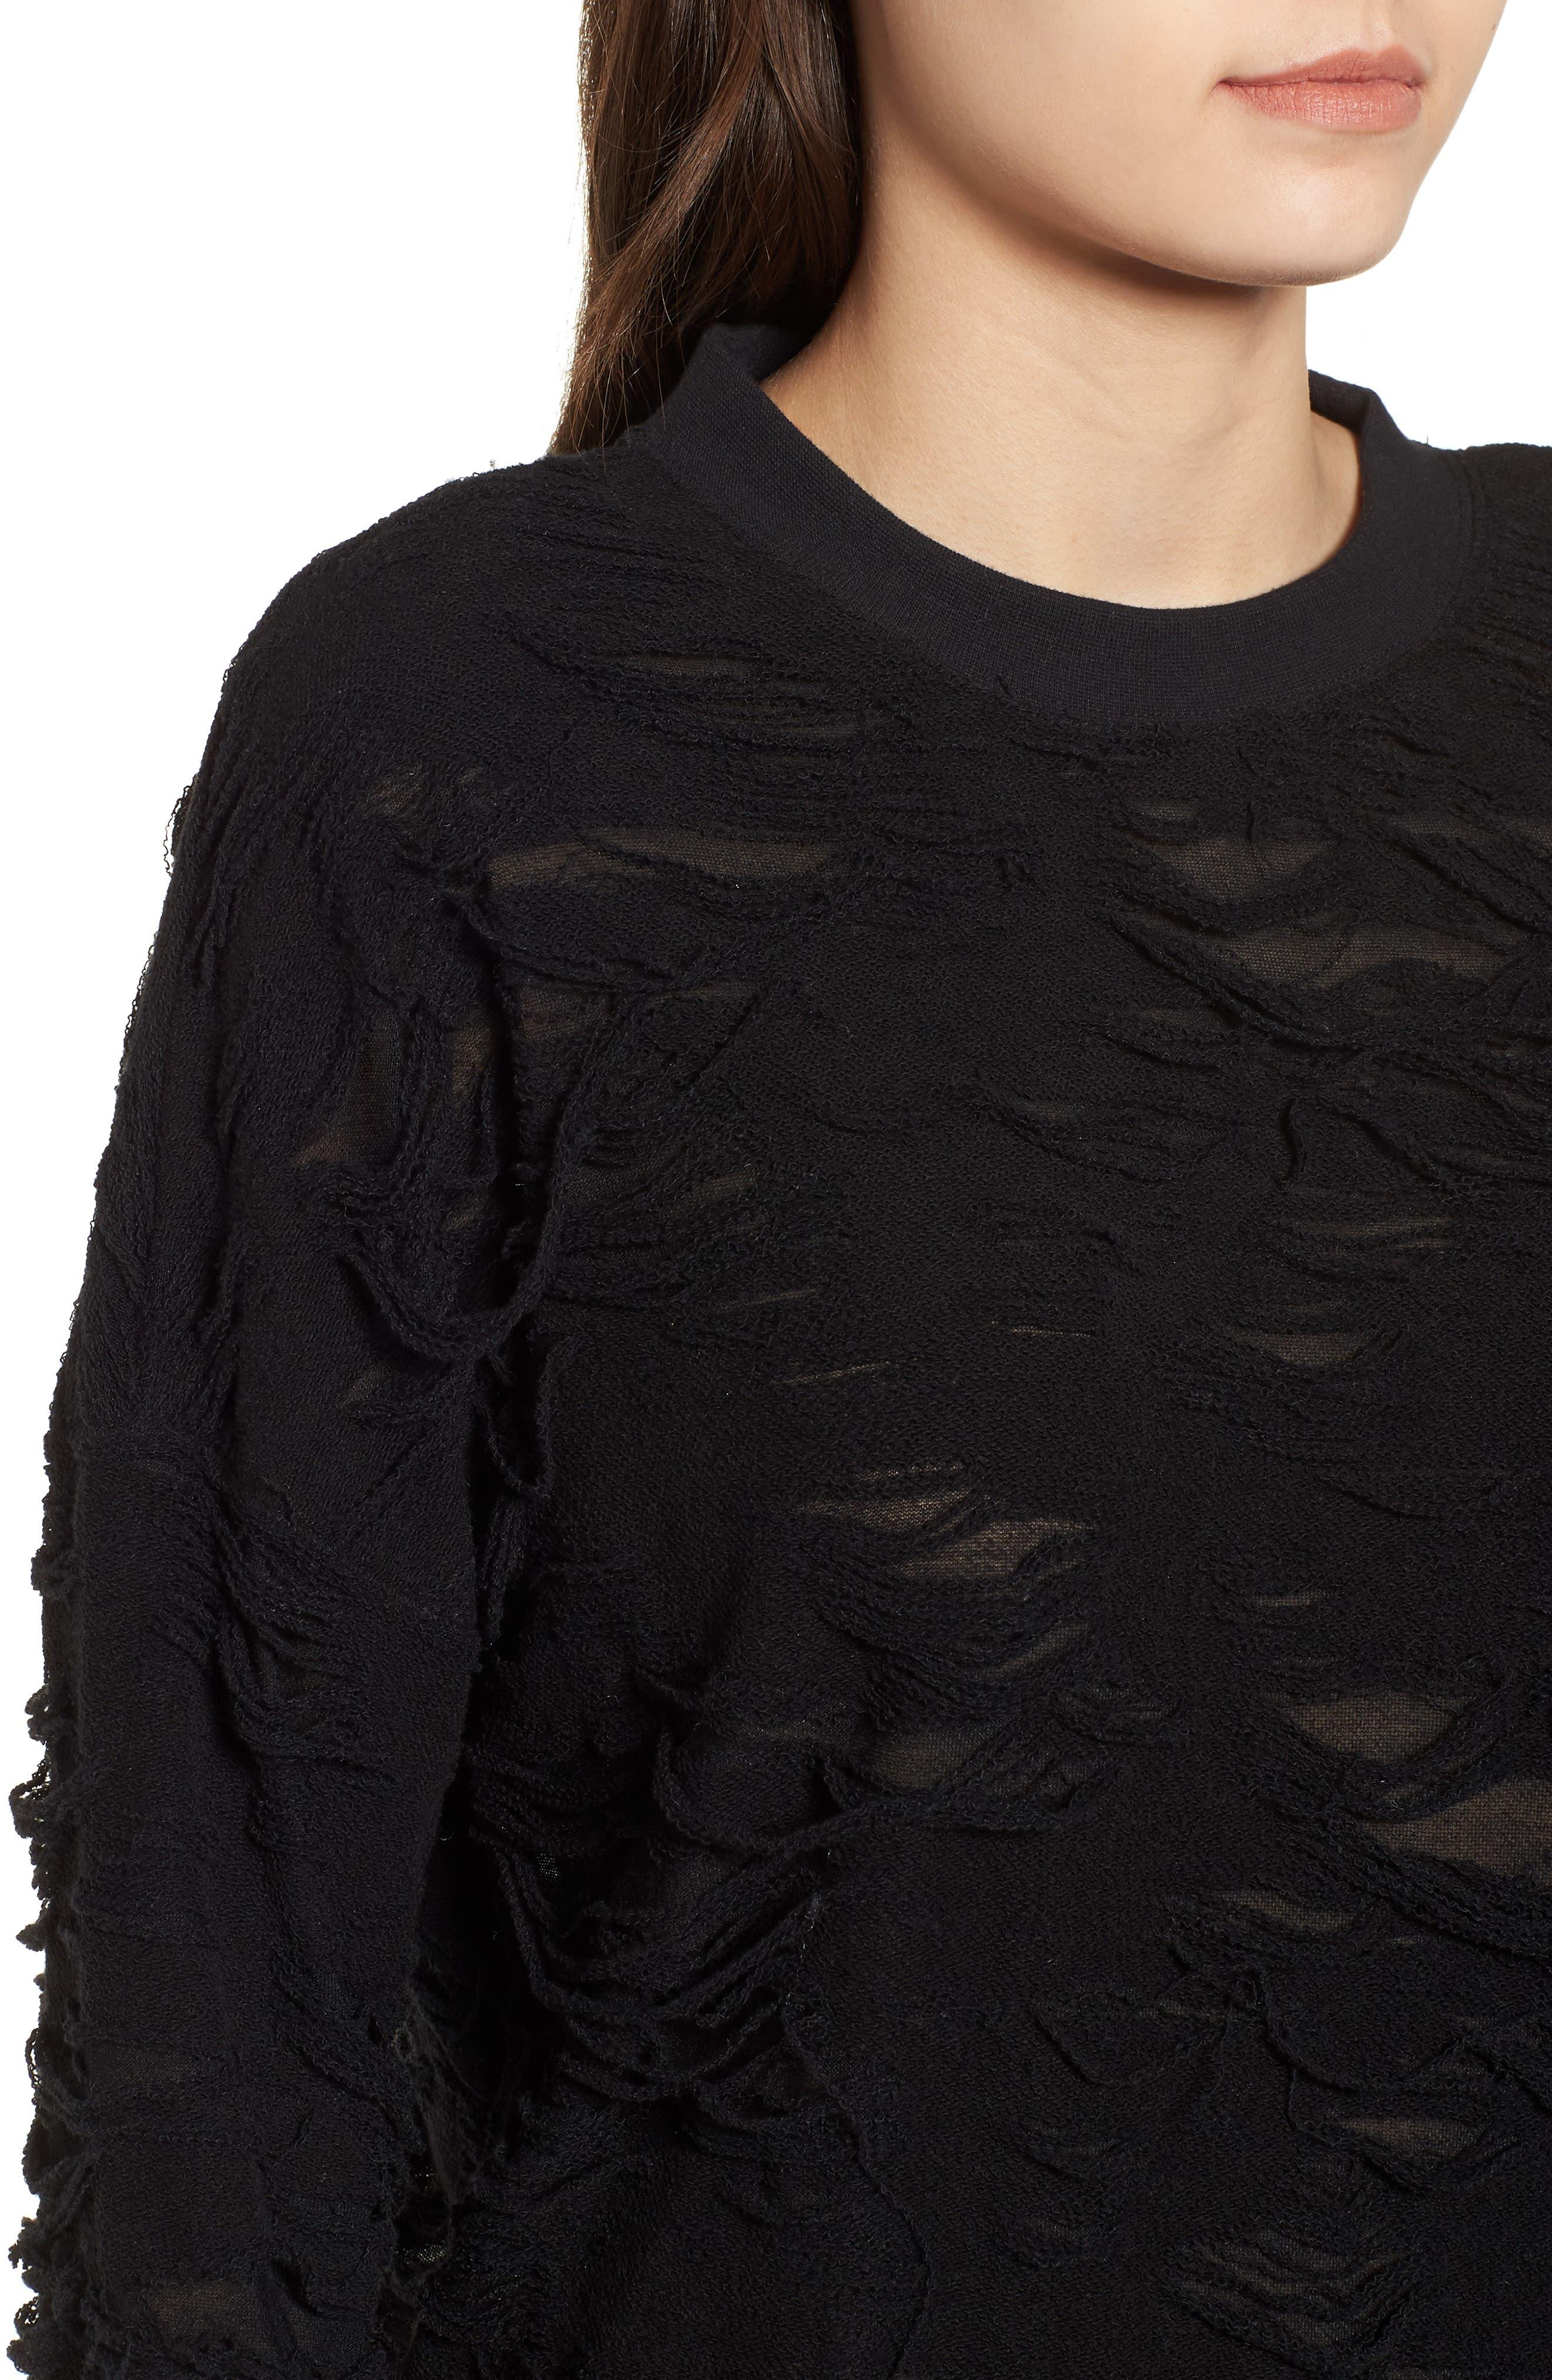 Me Too Slashed Sweatshirt,                             Alternate thumbnail 4, color,                             Black